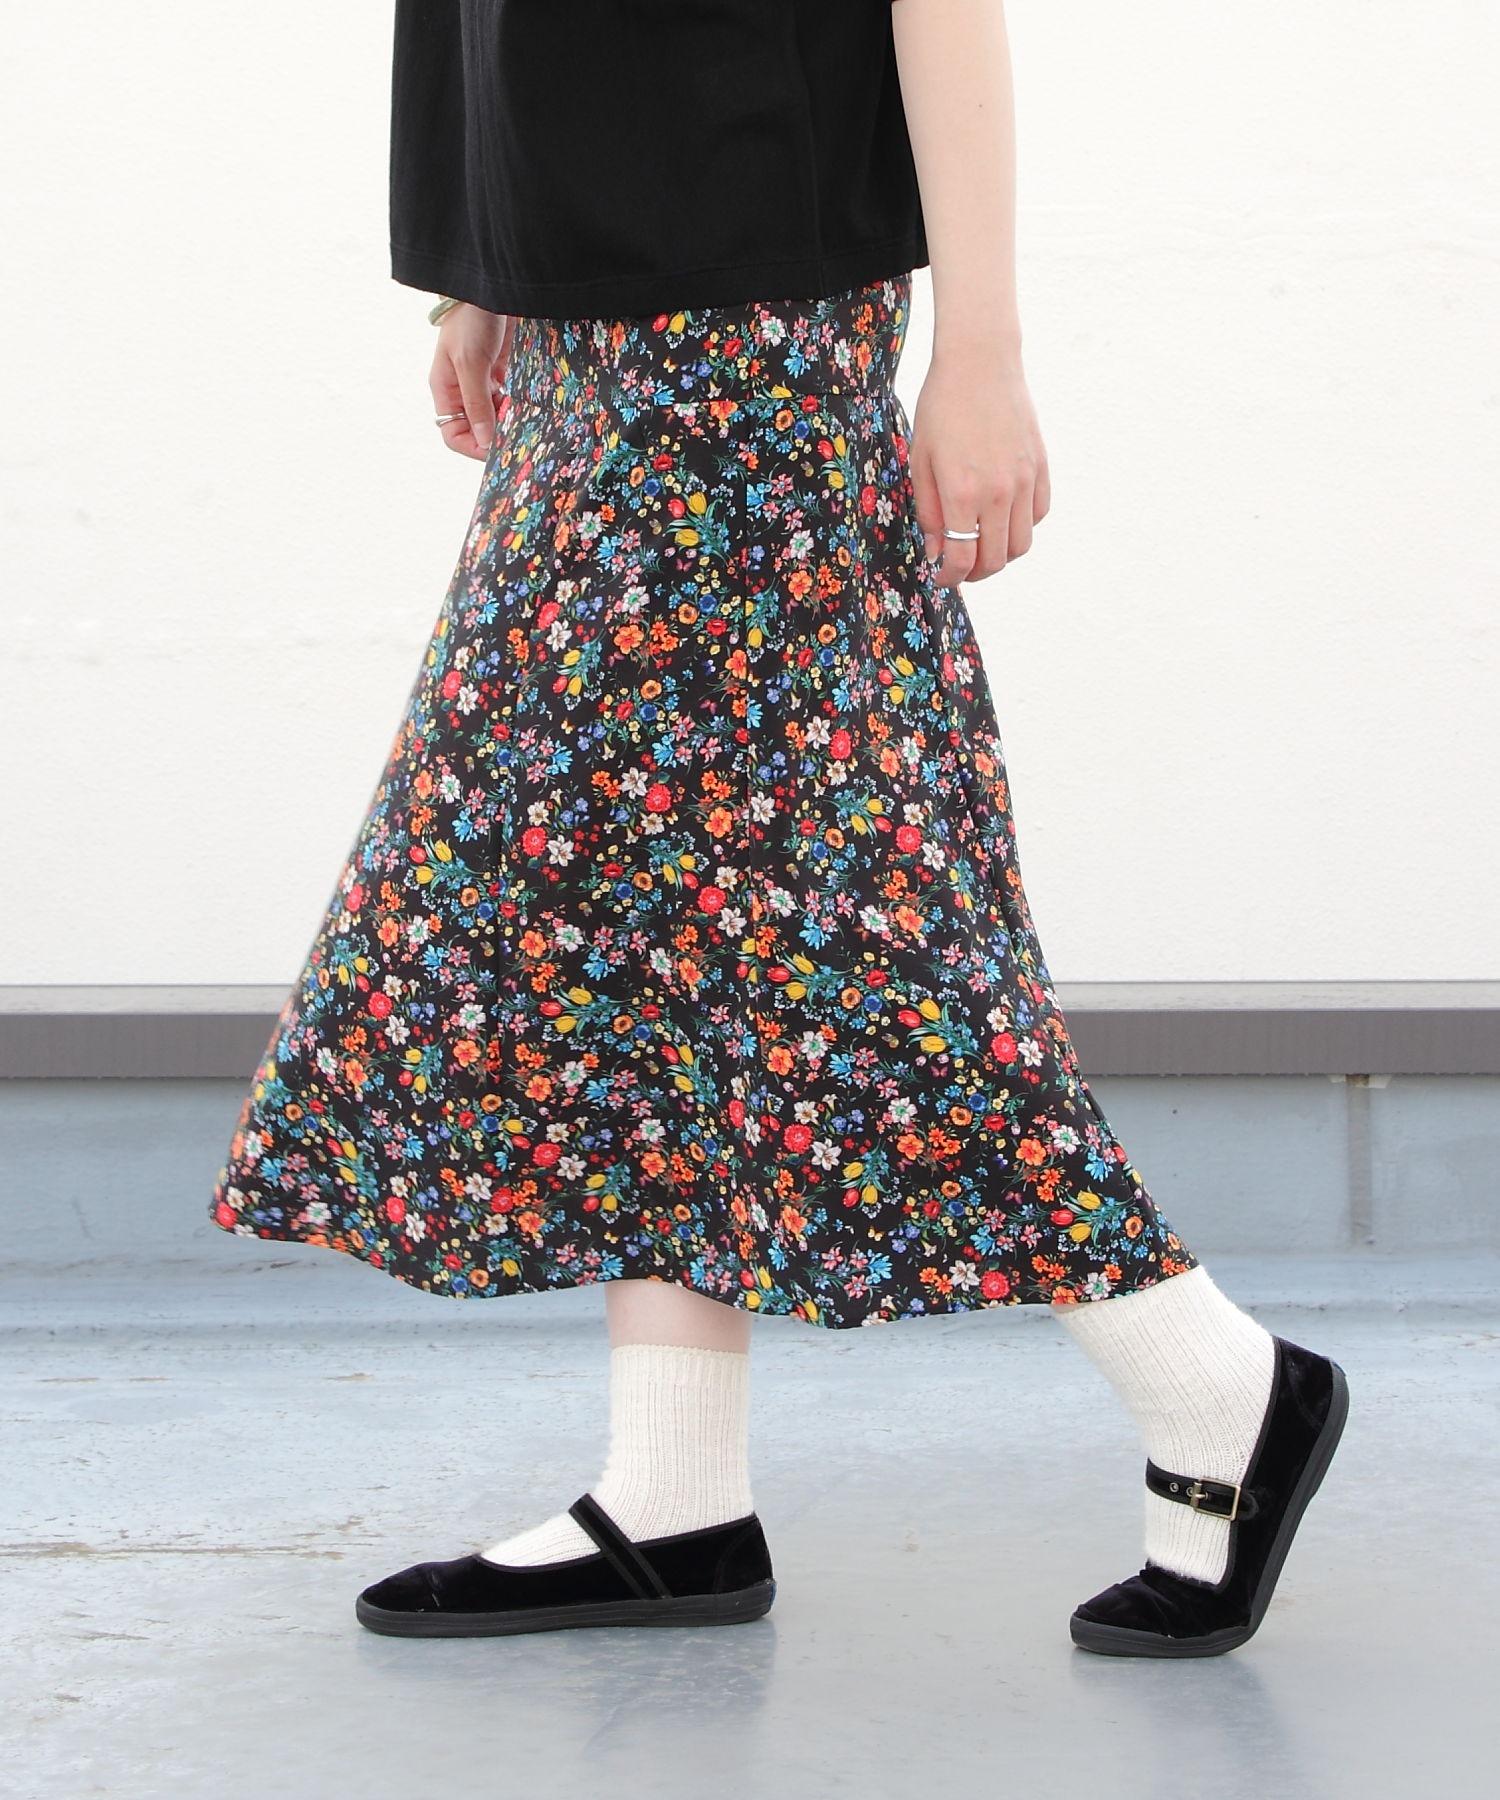 MEYAME/メヤメ ビューティフルスカート BEAUTIFUL SKIRT